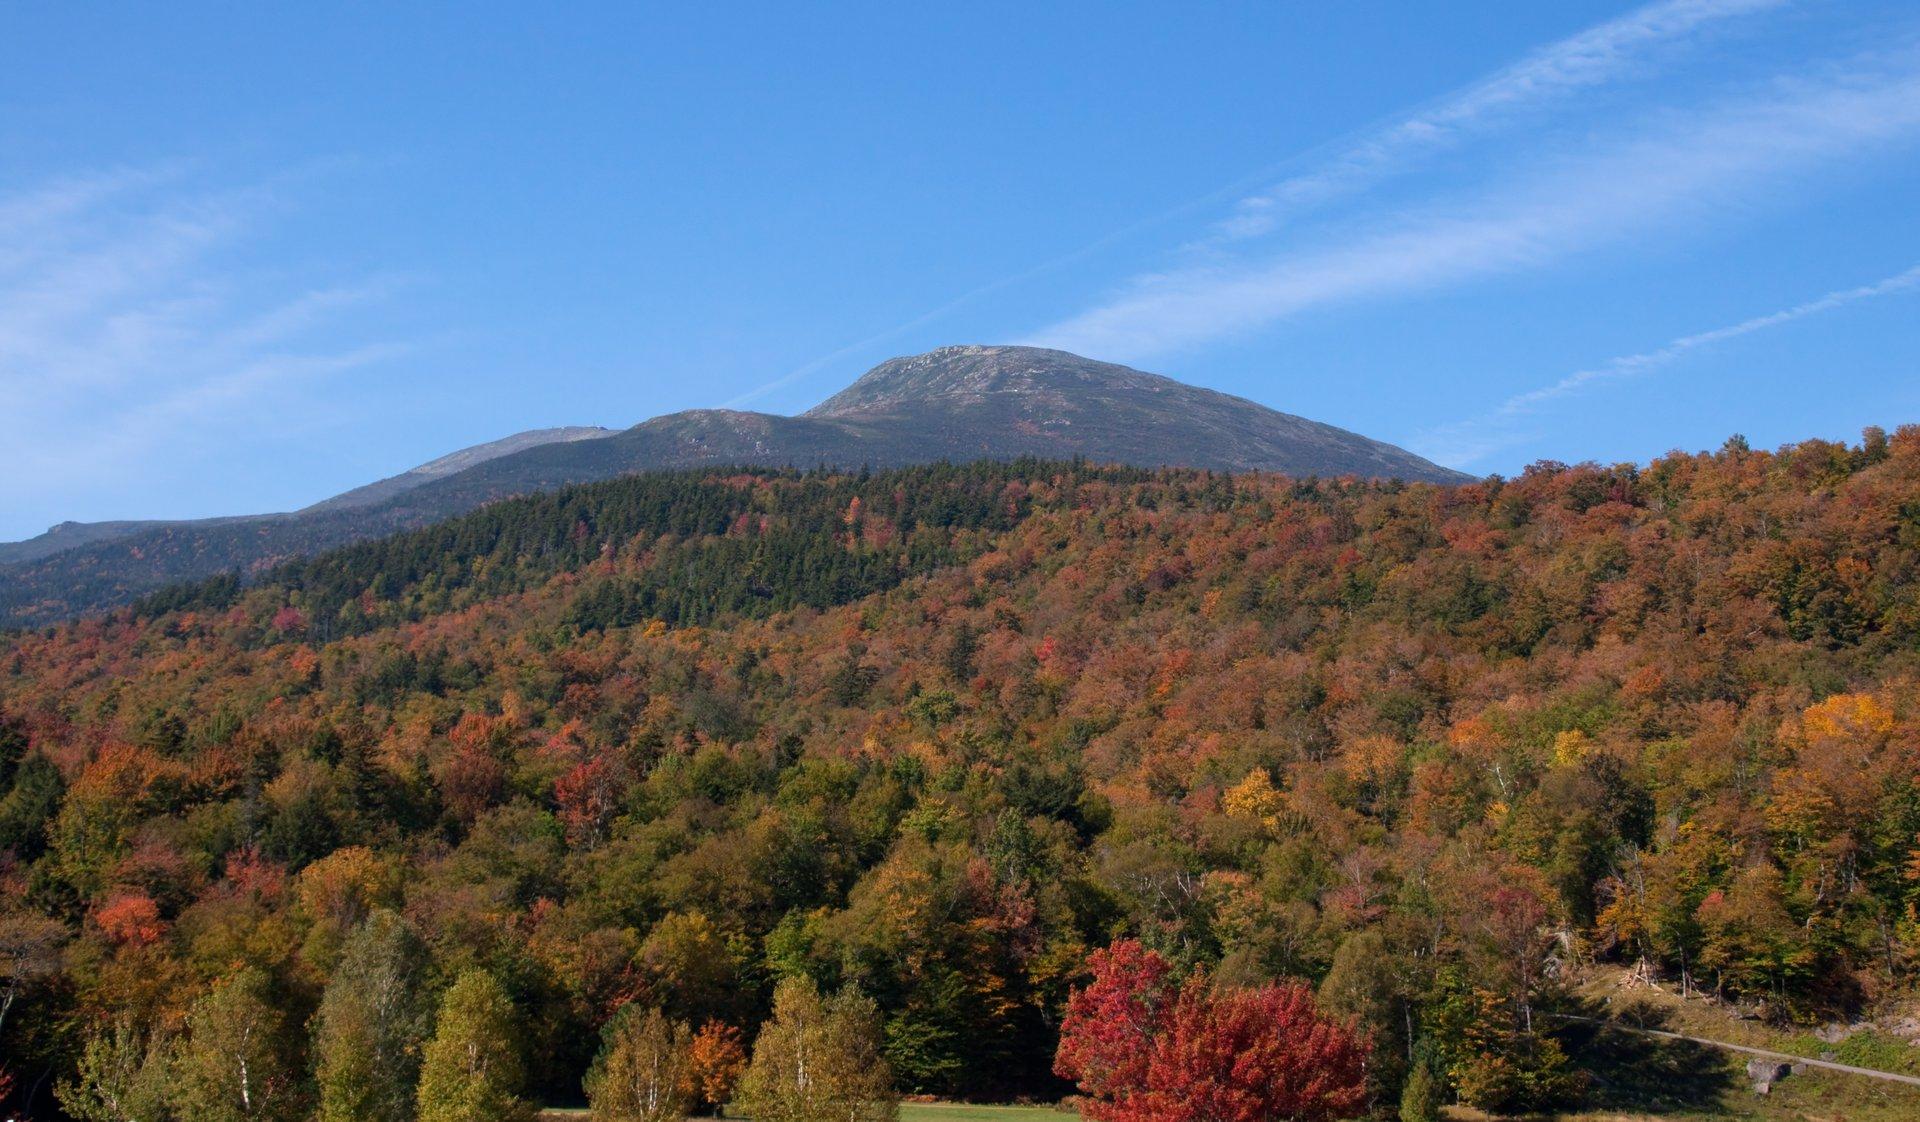 Mount Washington in New Hampshire - Best Season 2020